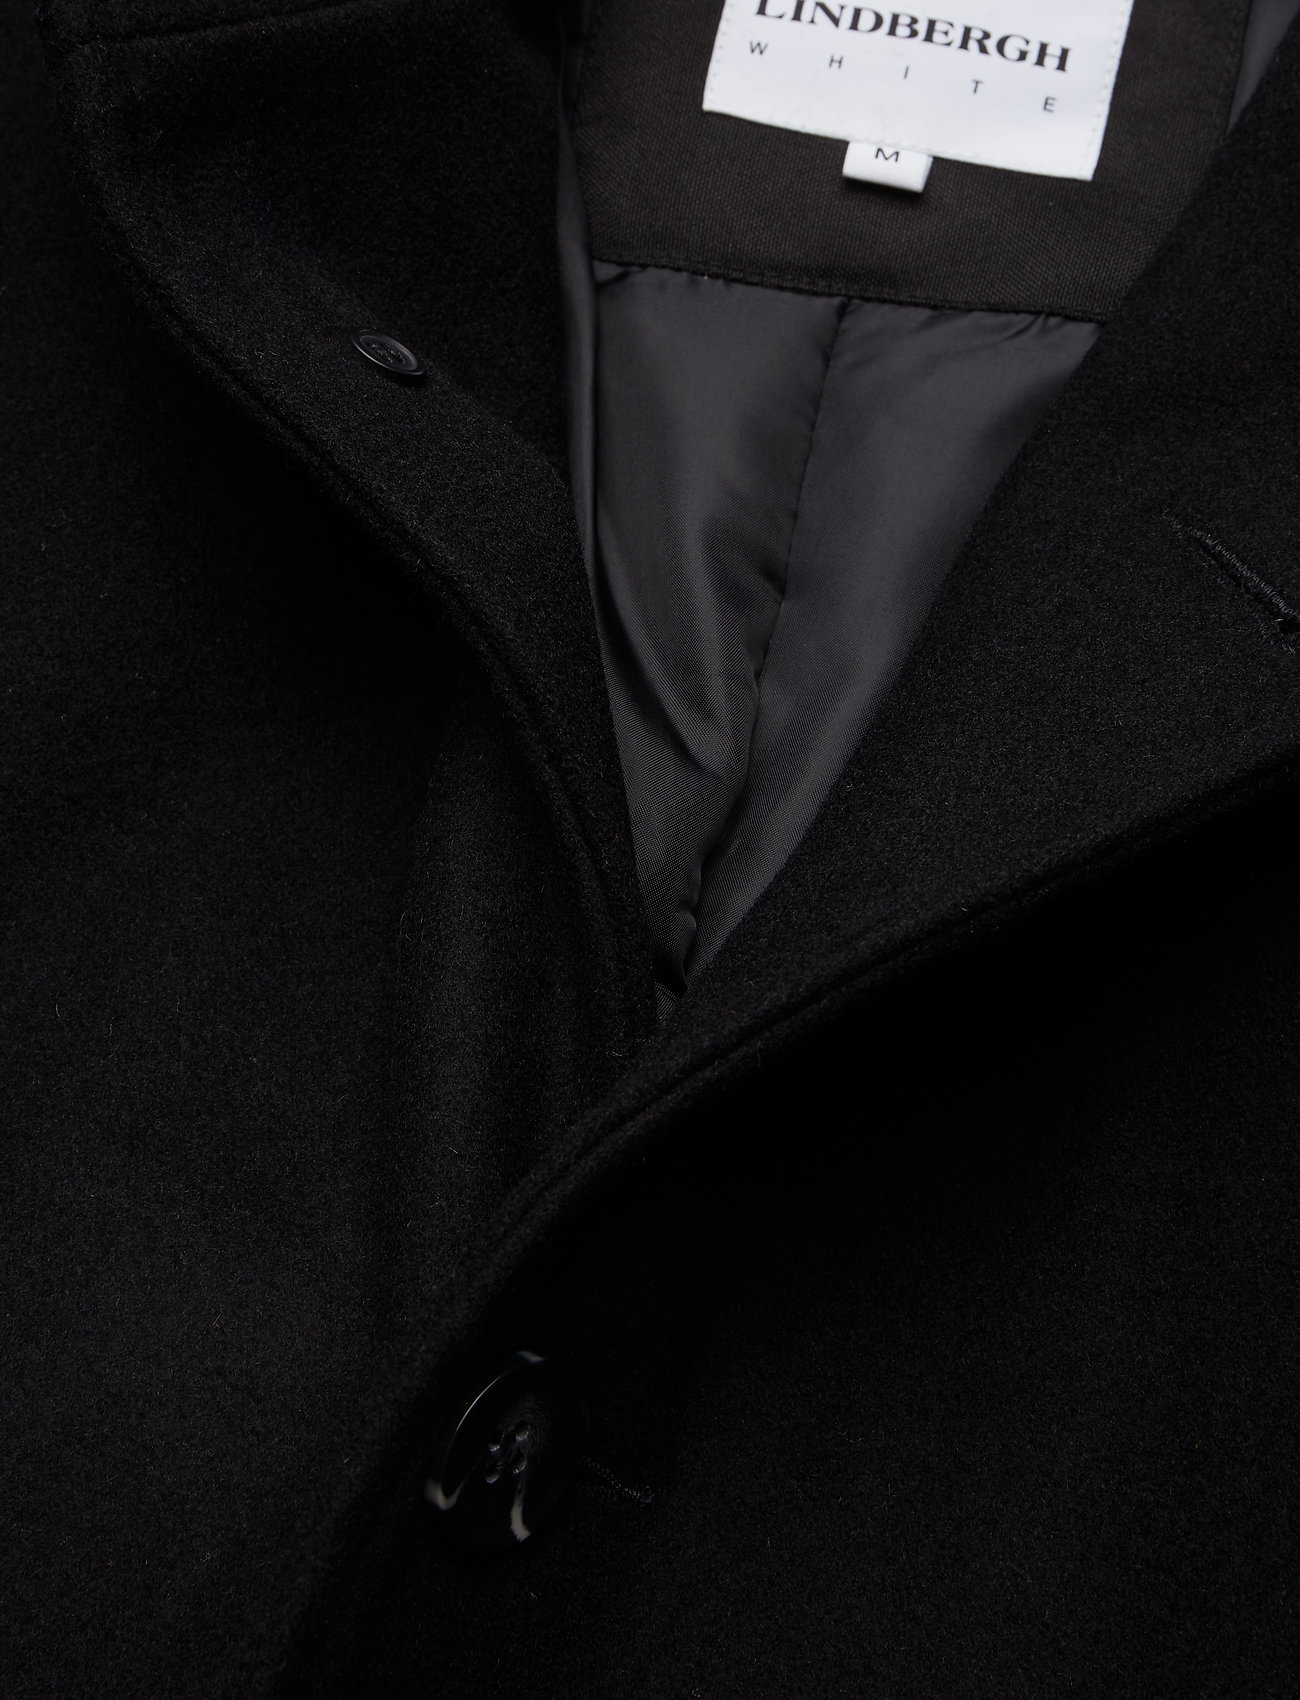 Coat CollarblackLindbergh With Mens CollarblackLindbergh Coat With Stand Coat Stand Mens Mens With Klc31TFJ